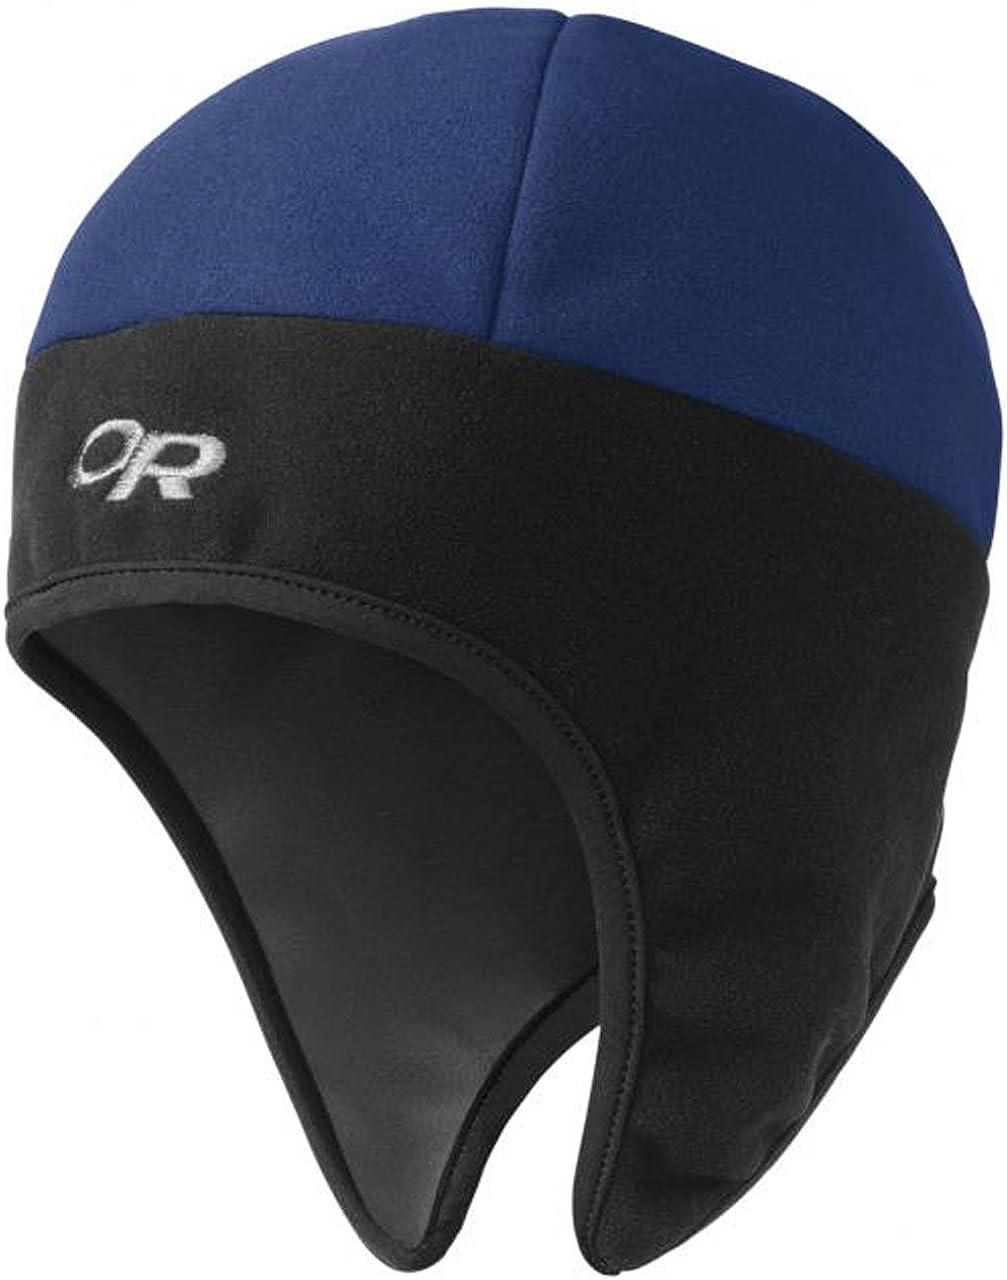 Outdoor Research Peruvian Gore-TEX Infinium Hat – Mountaineering Hat